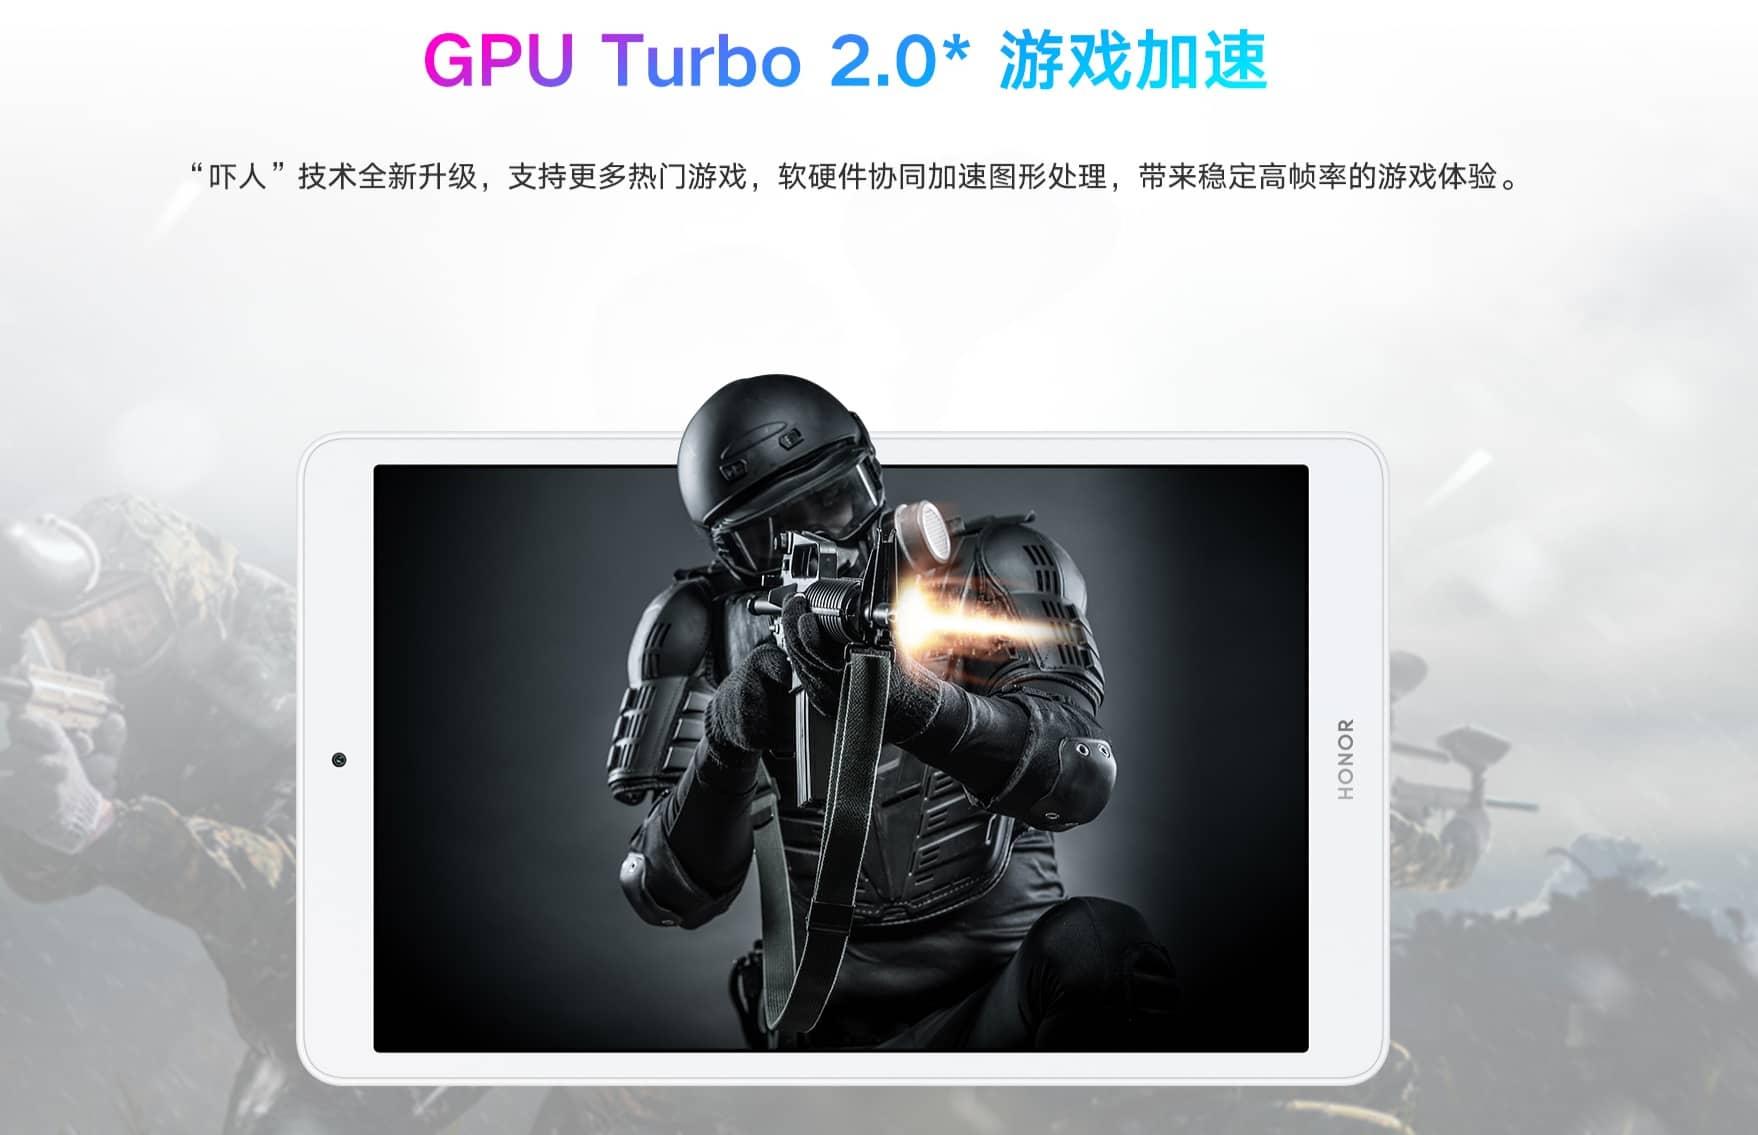 Honor Tab 5 Features - تبلت آنر تب 5 با نمایشگر 8 اینچی و باتری 5100 میلی آمپر ساعتی عرضه کرد